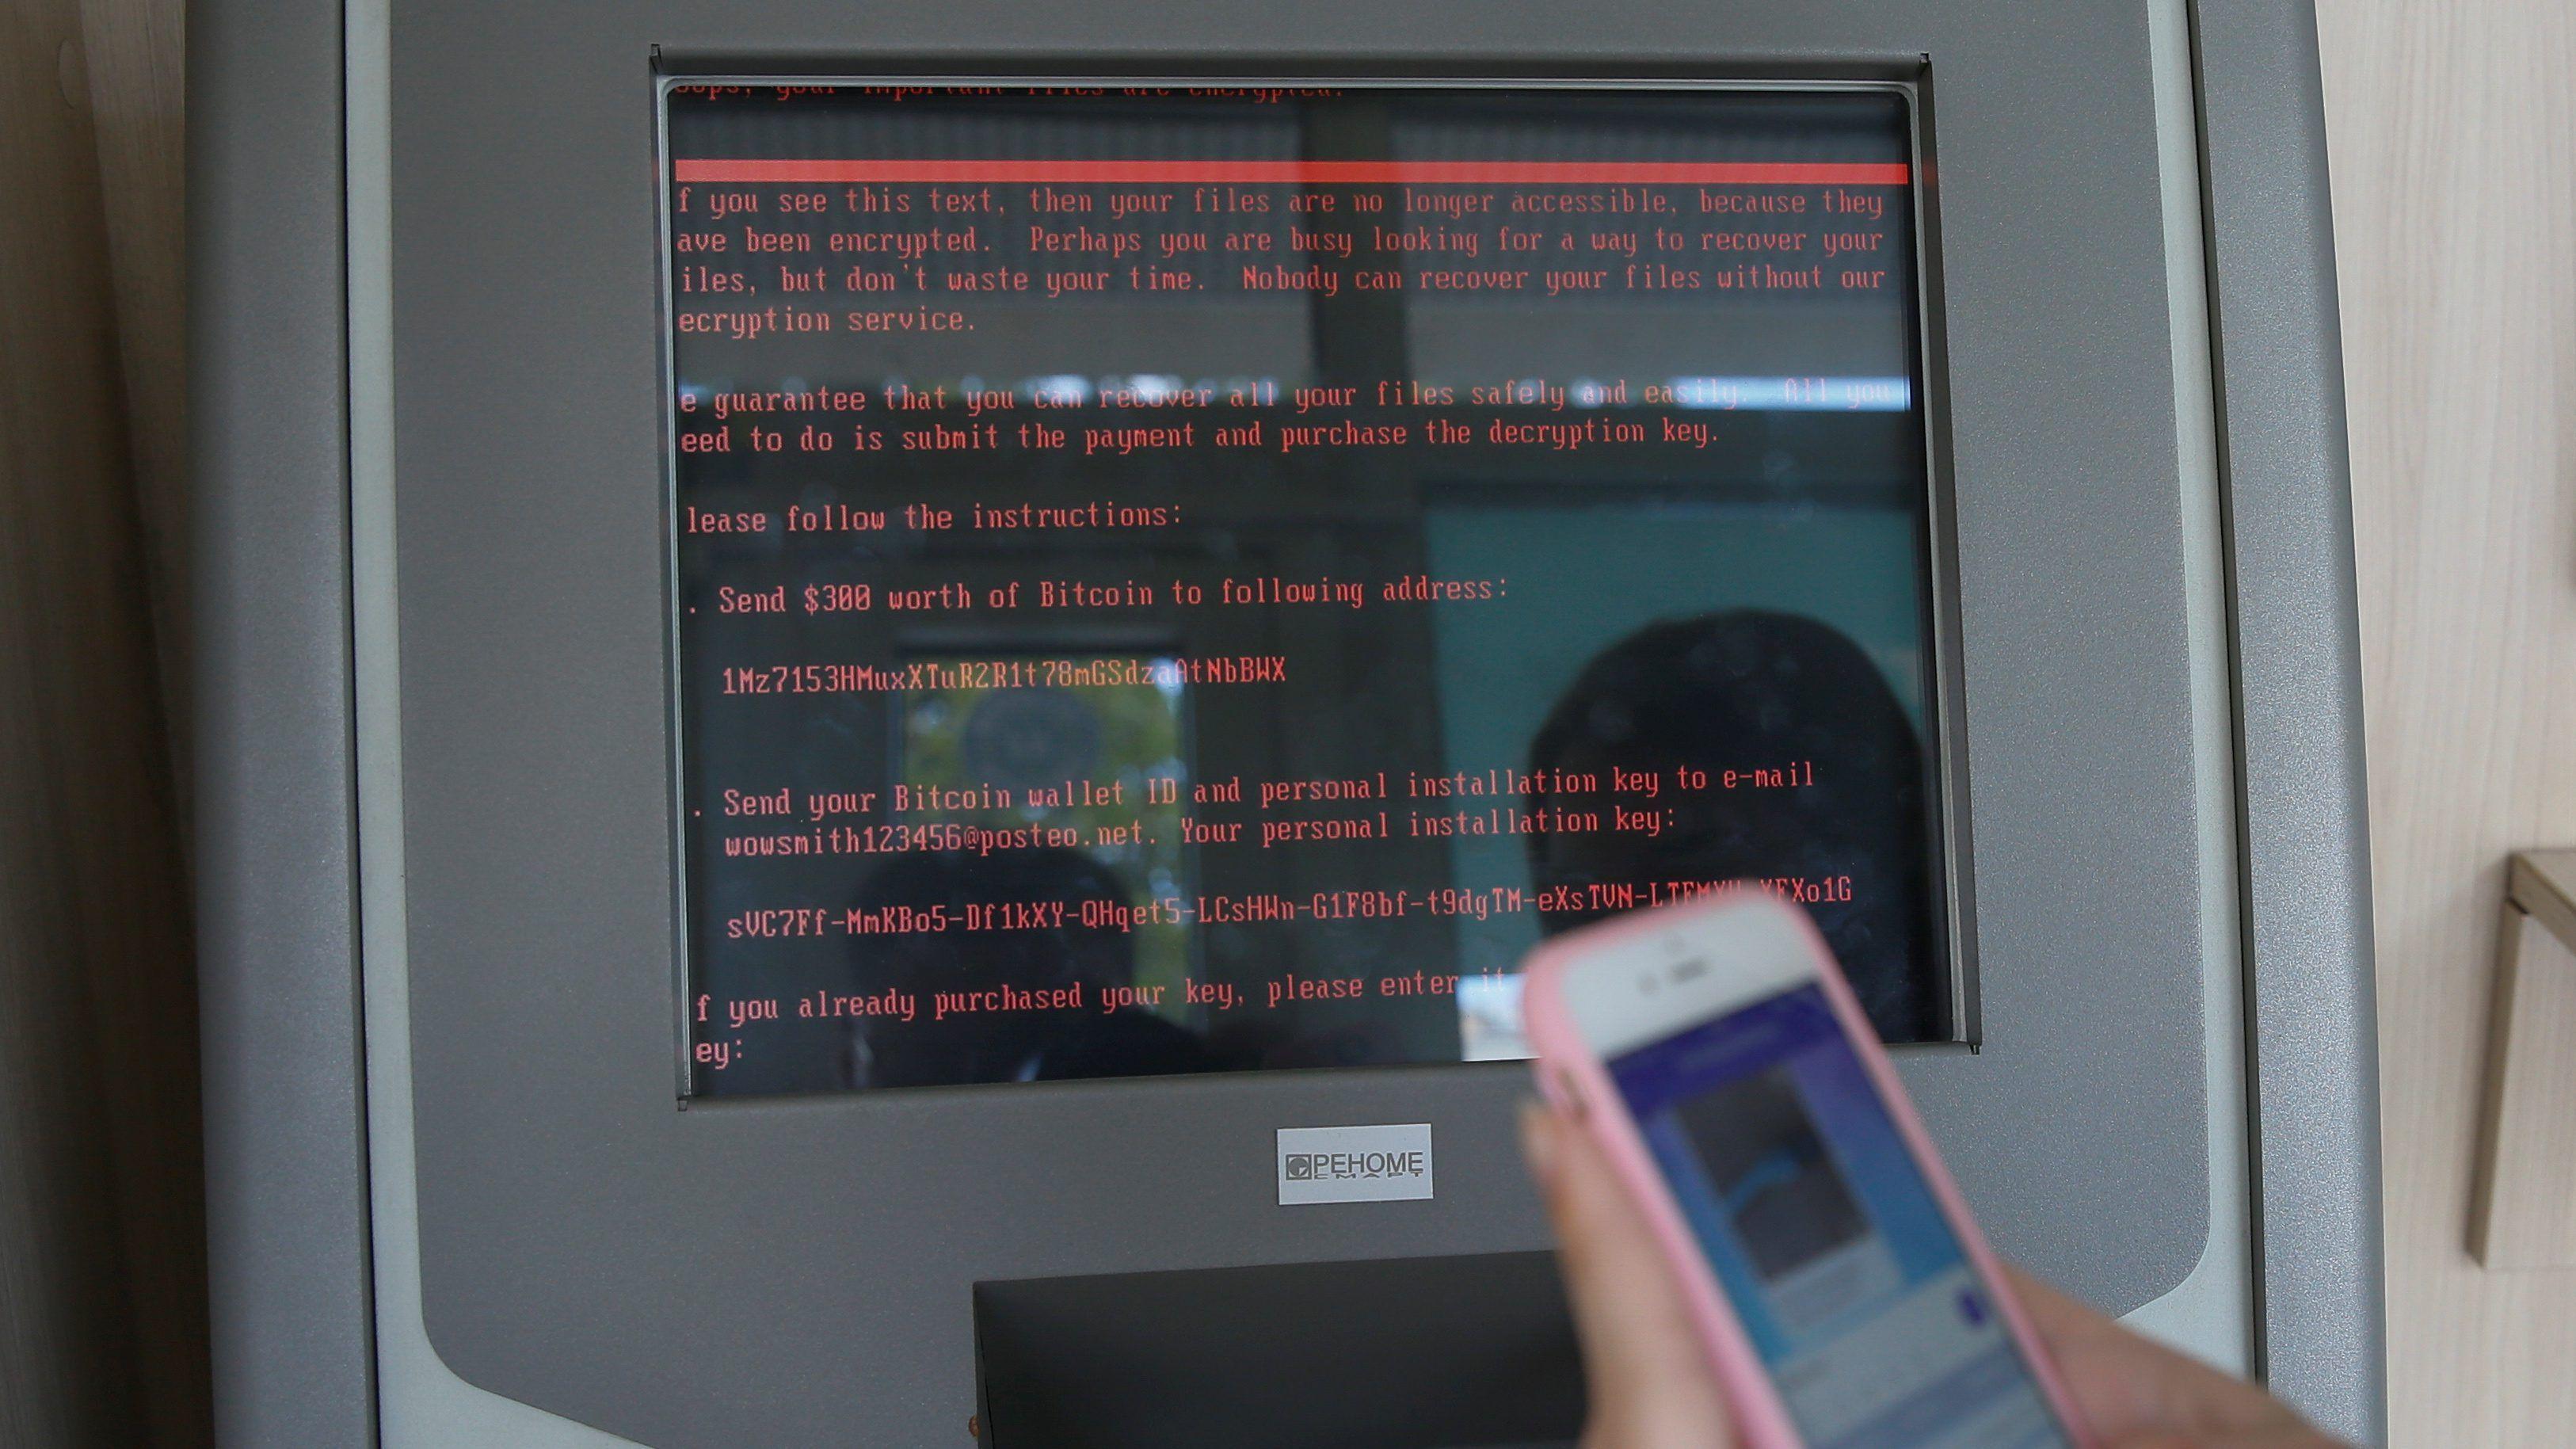 ukraine-atm-petya-ransomware-e1498578179223.jpg